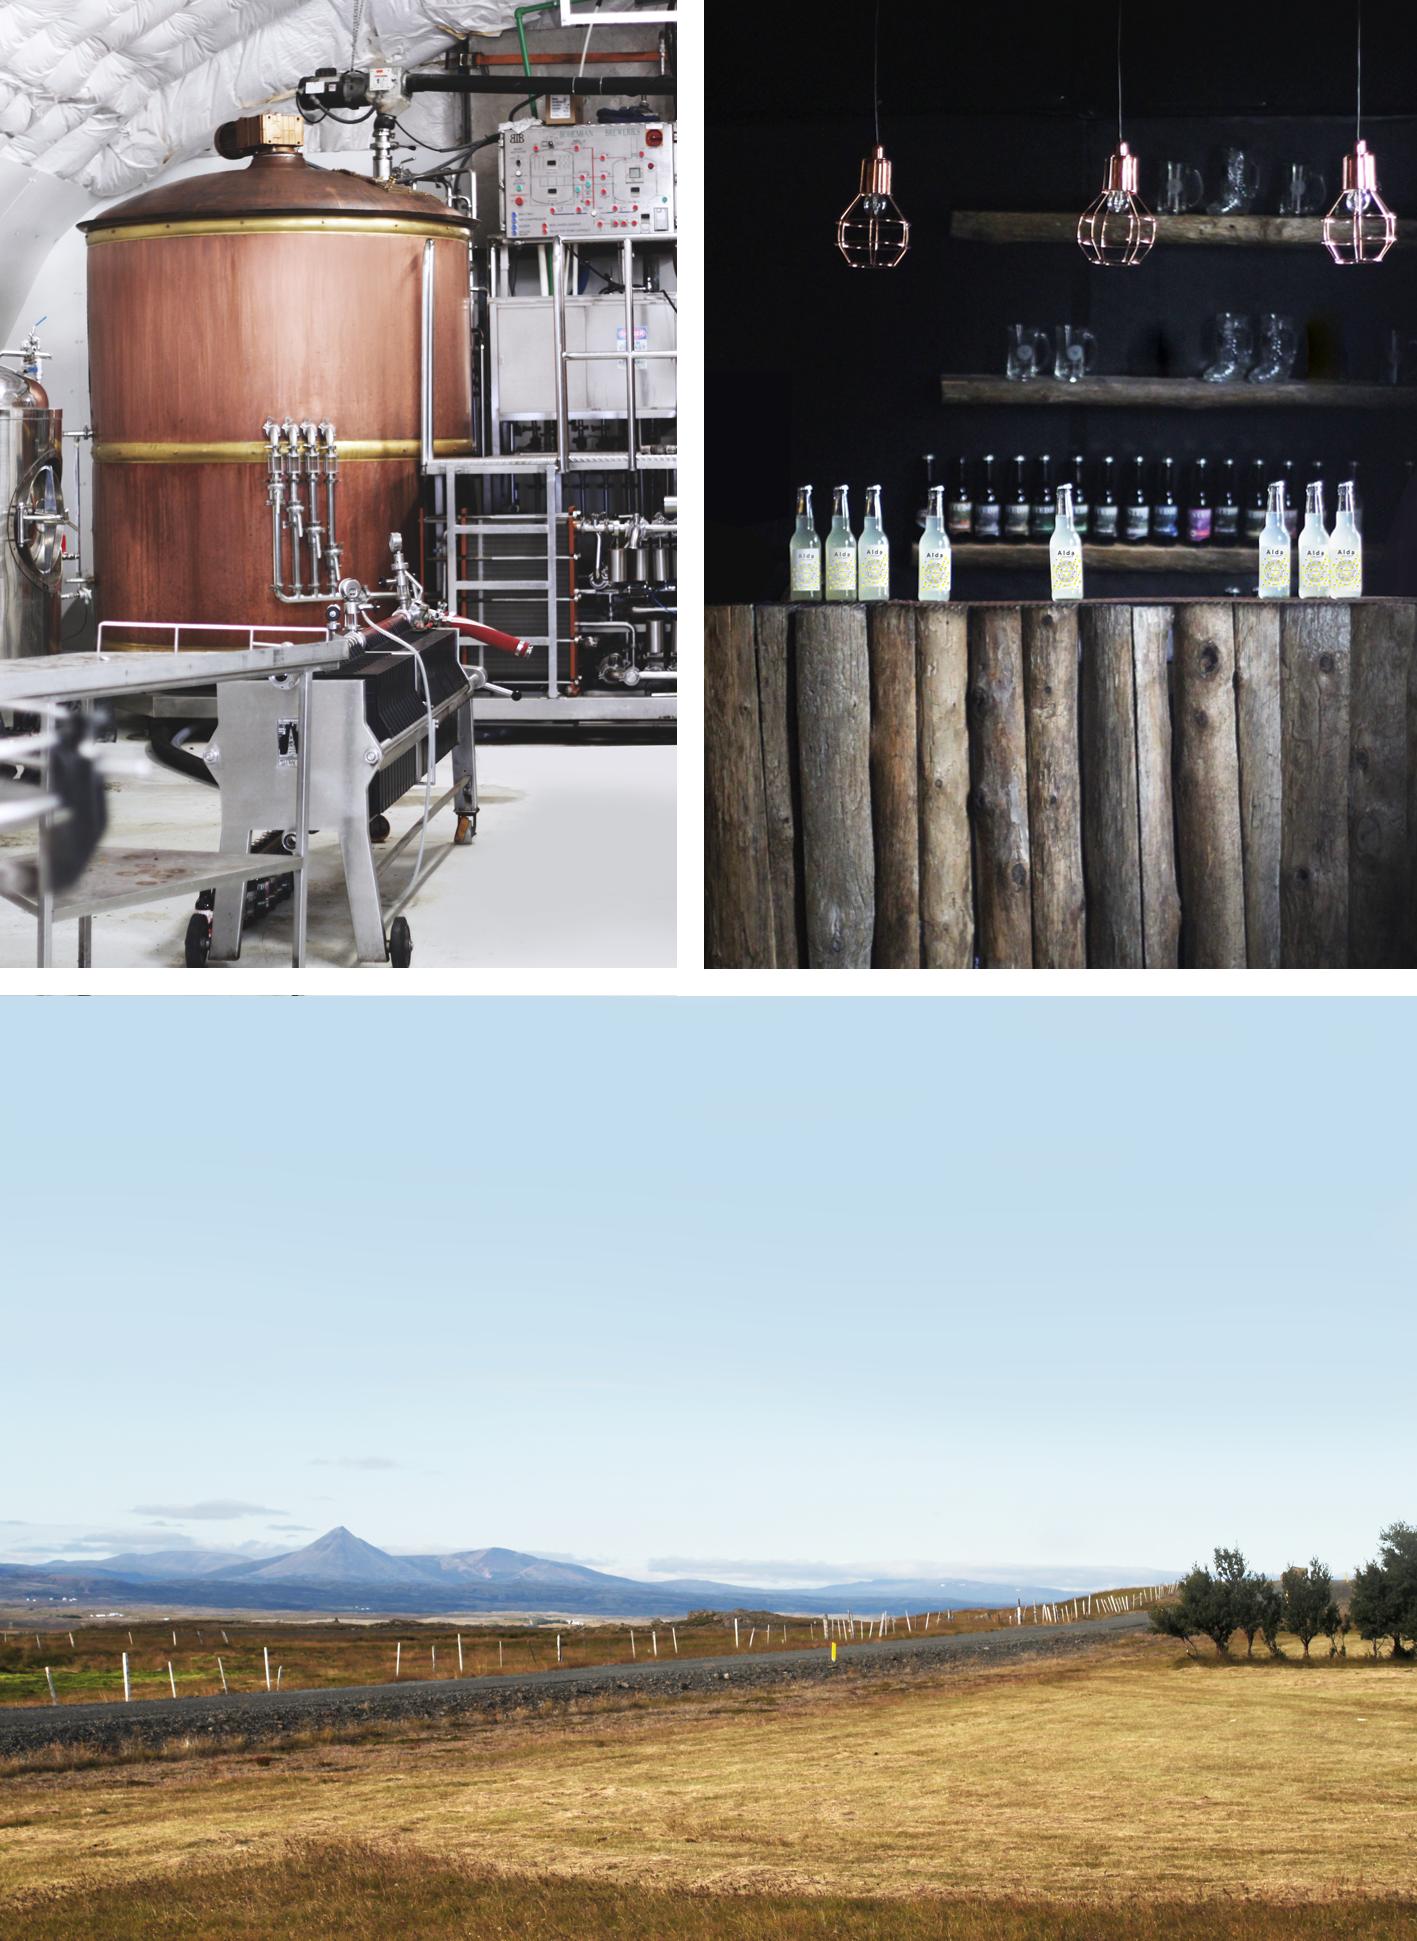 Alda is brewed in Steðji Brewery in Borgarfjörður, Iceland.